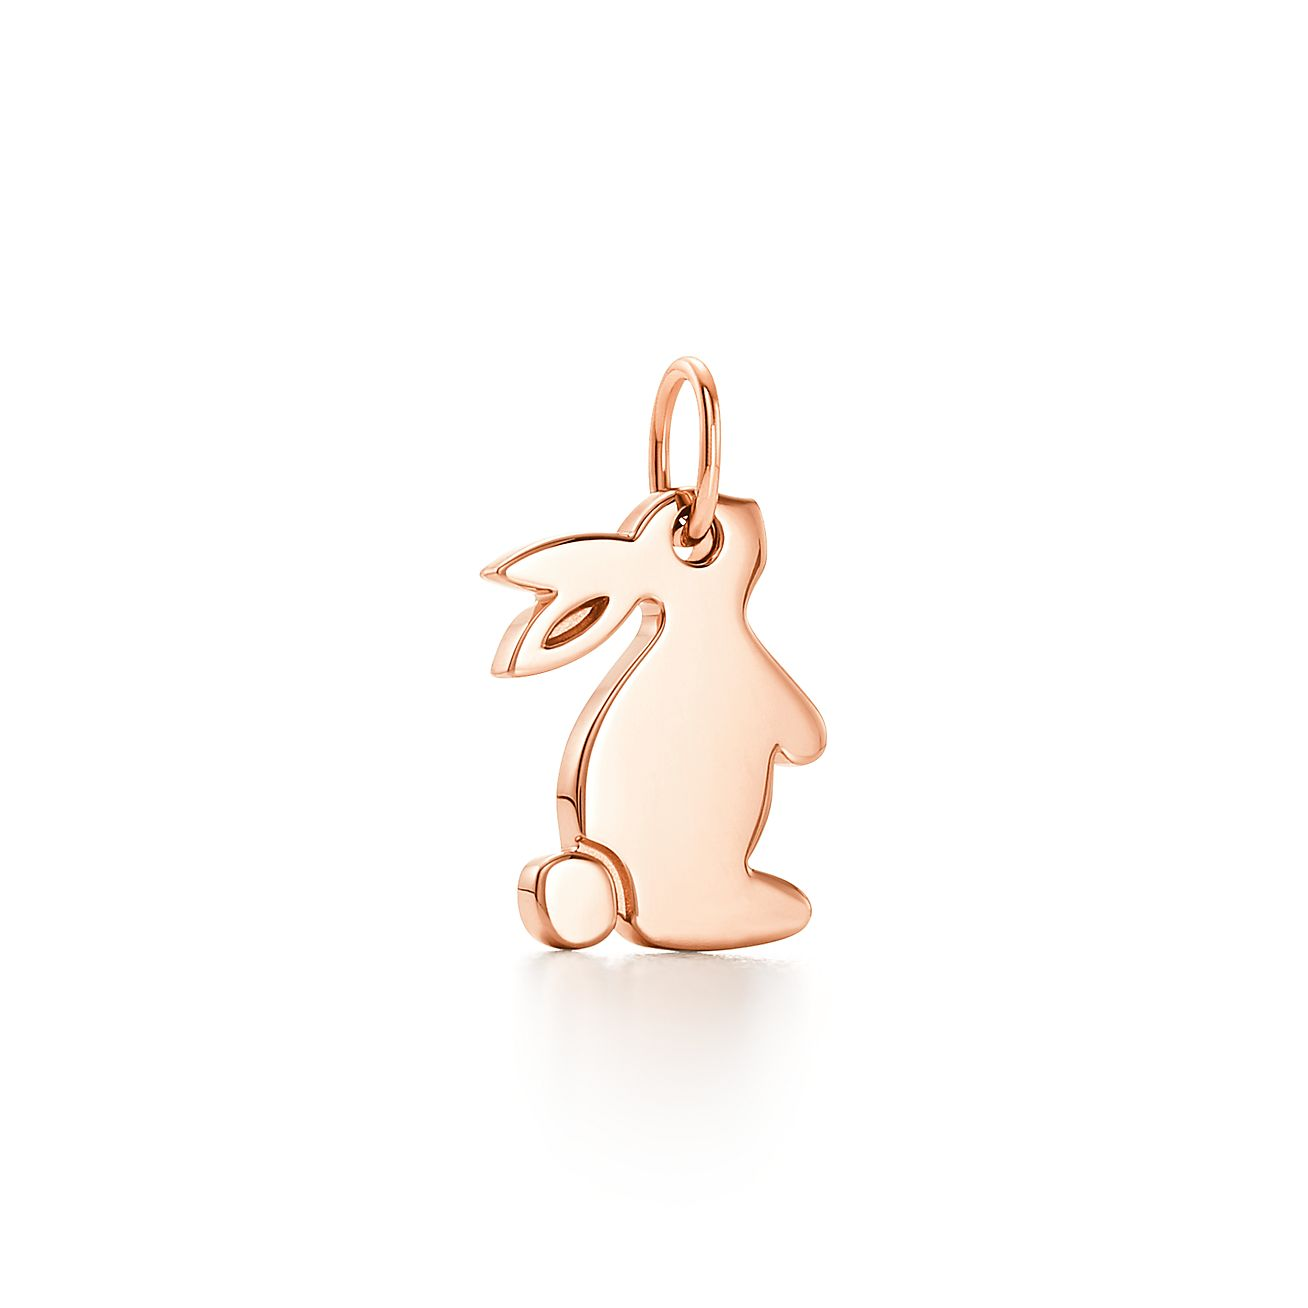 Tiffany Charms snuggle bunny charm in 18k gold Tiffany & Co.